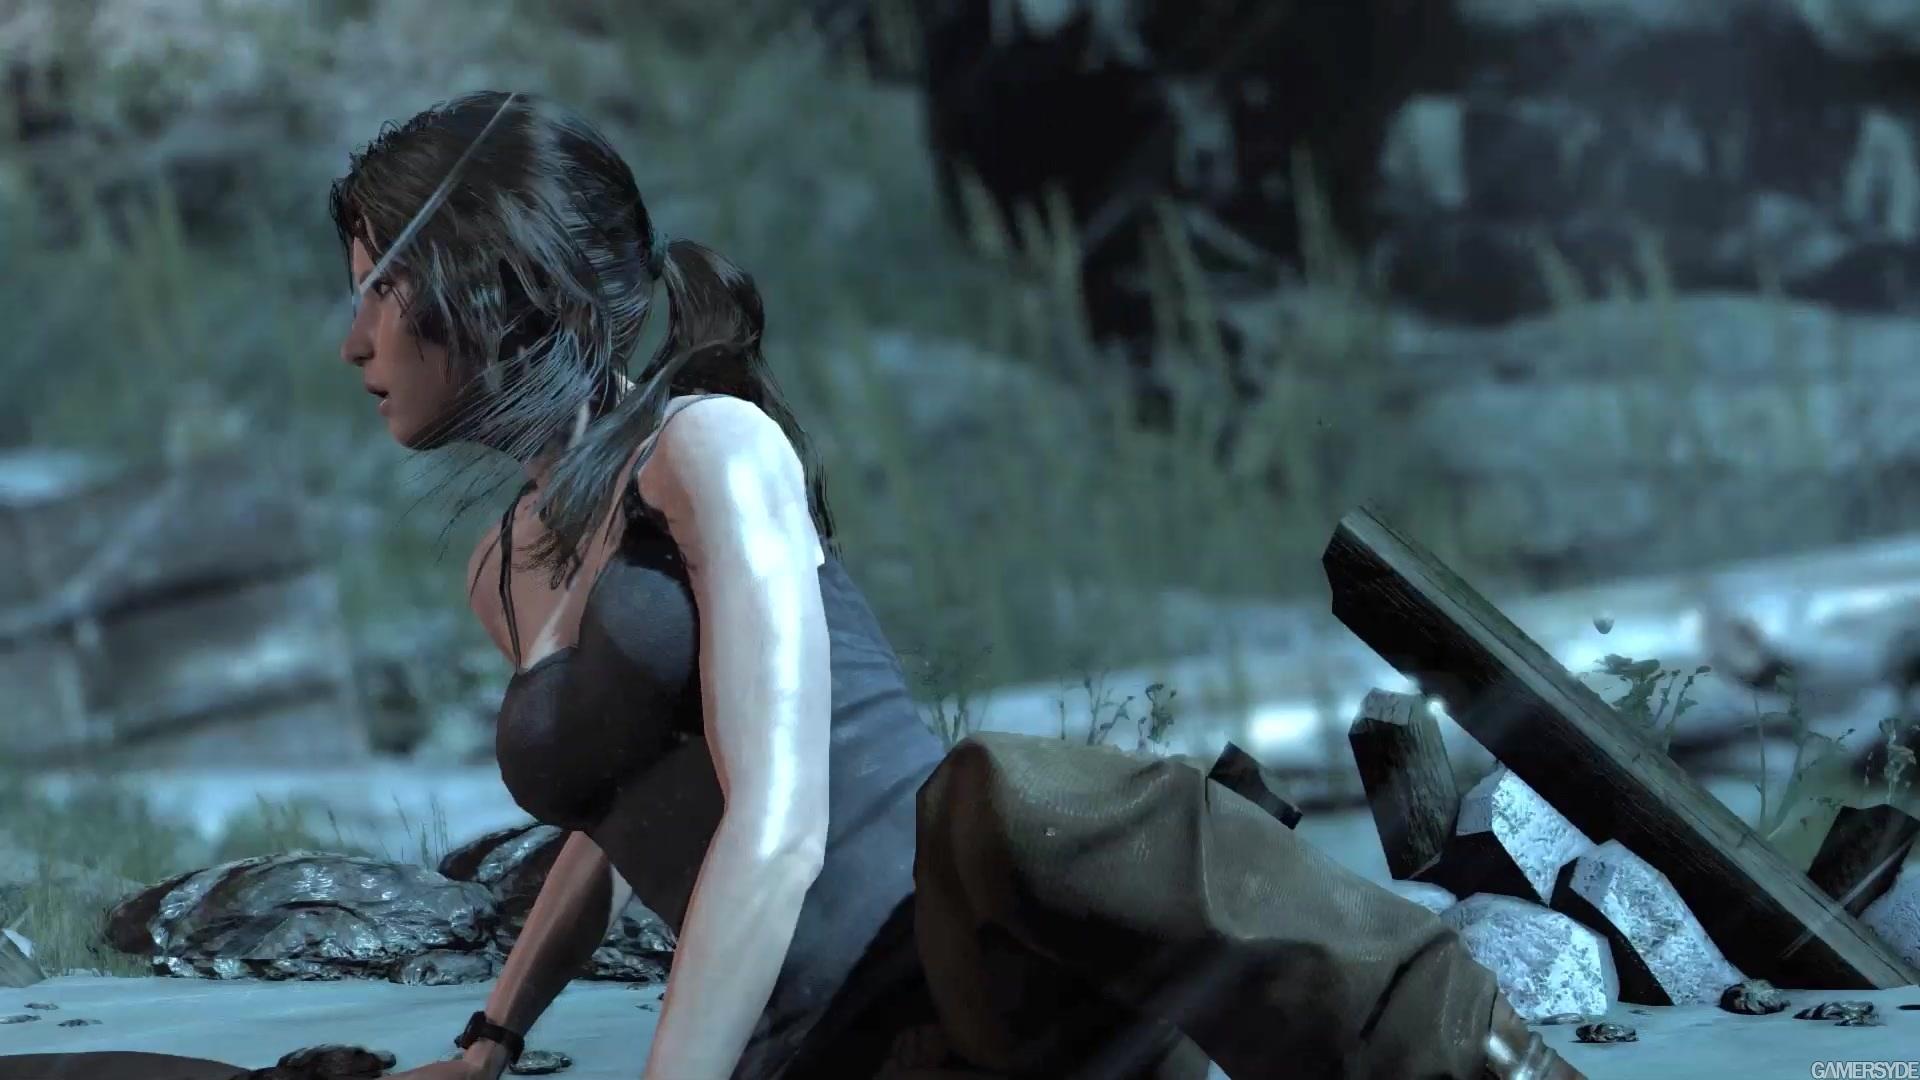 image tomb raider 24052 1912 0002 تصاویر جدیدی از عنوان Tomb Raider: Definitive Edition منتشر شد